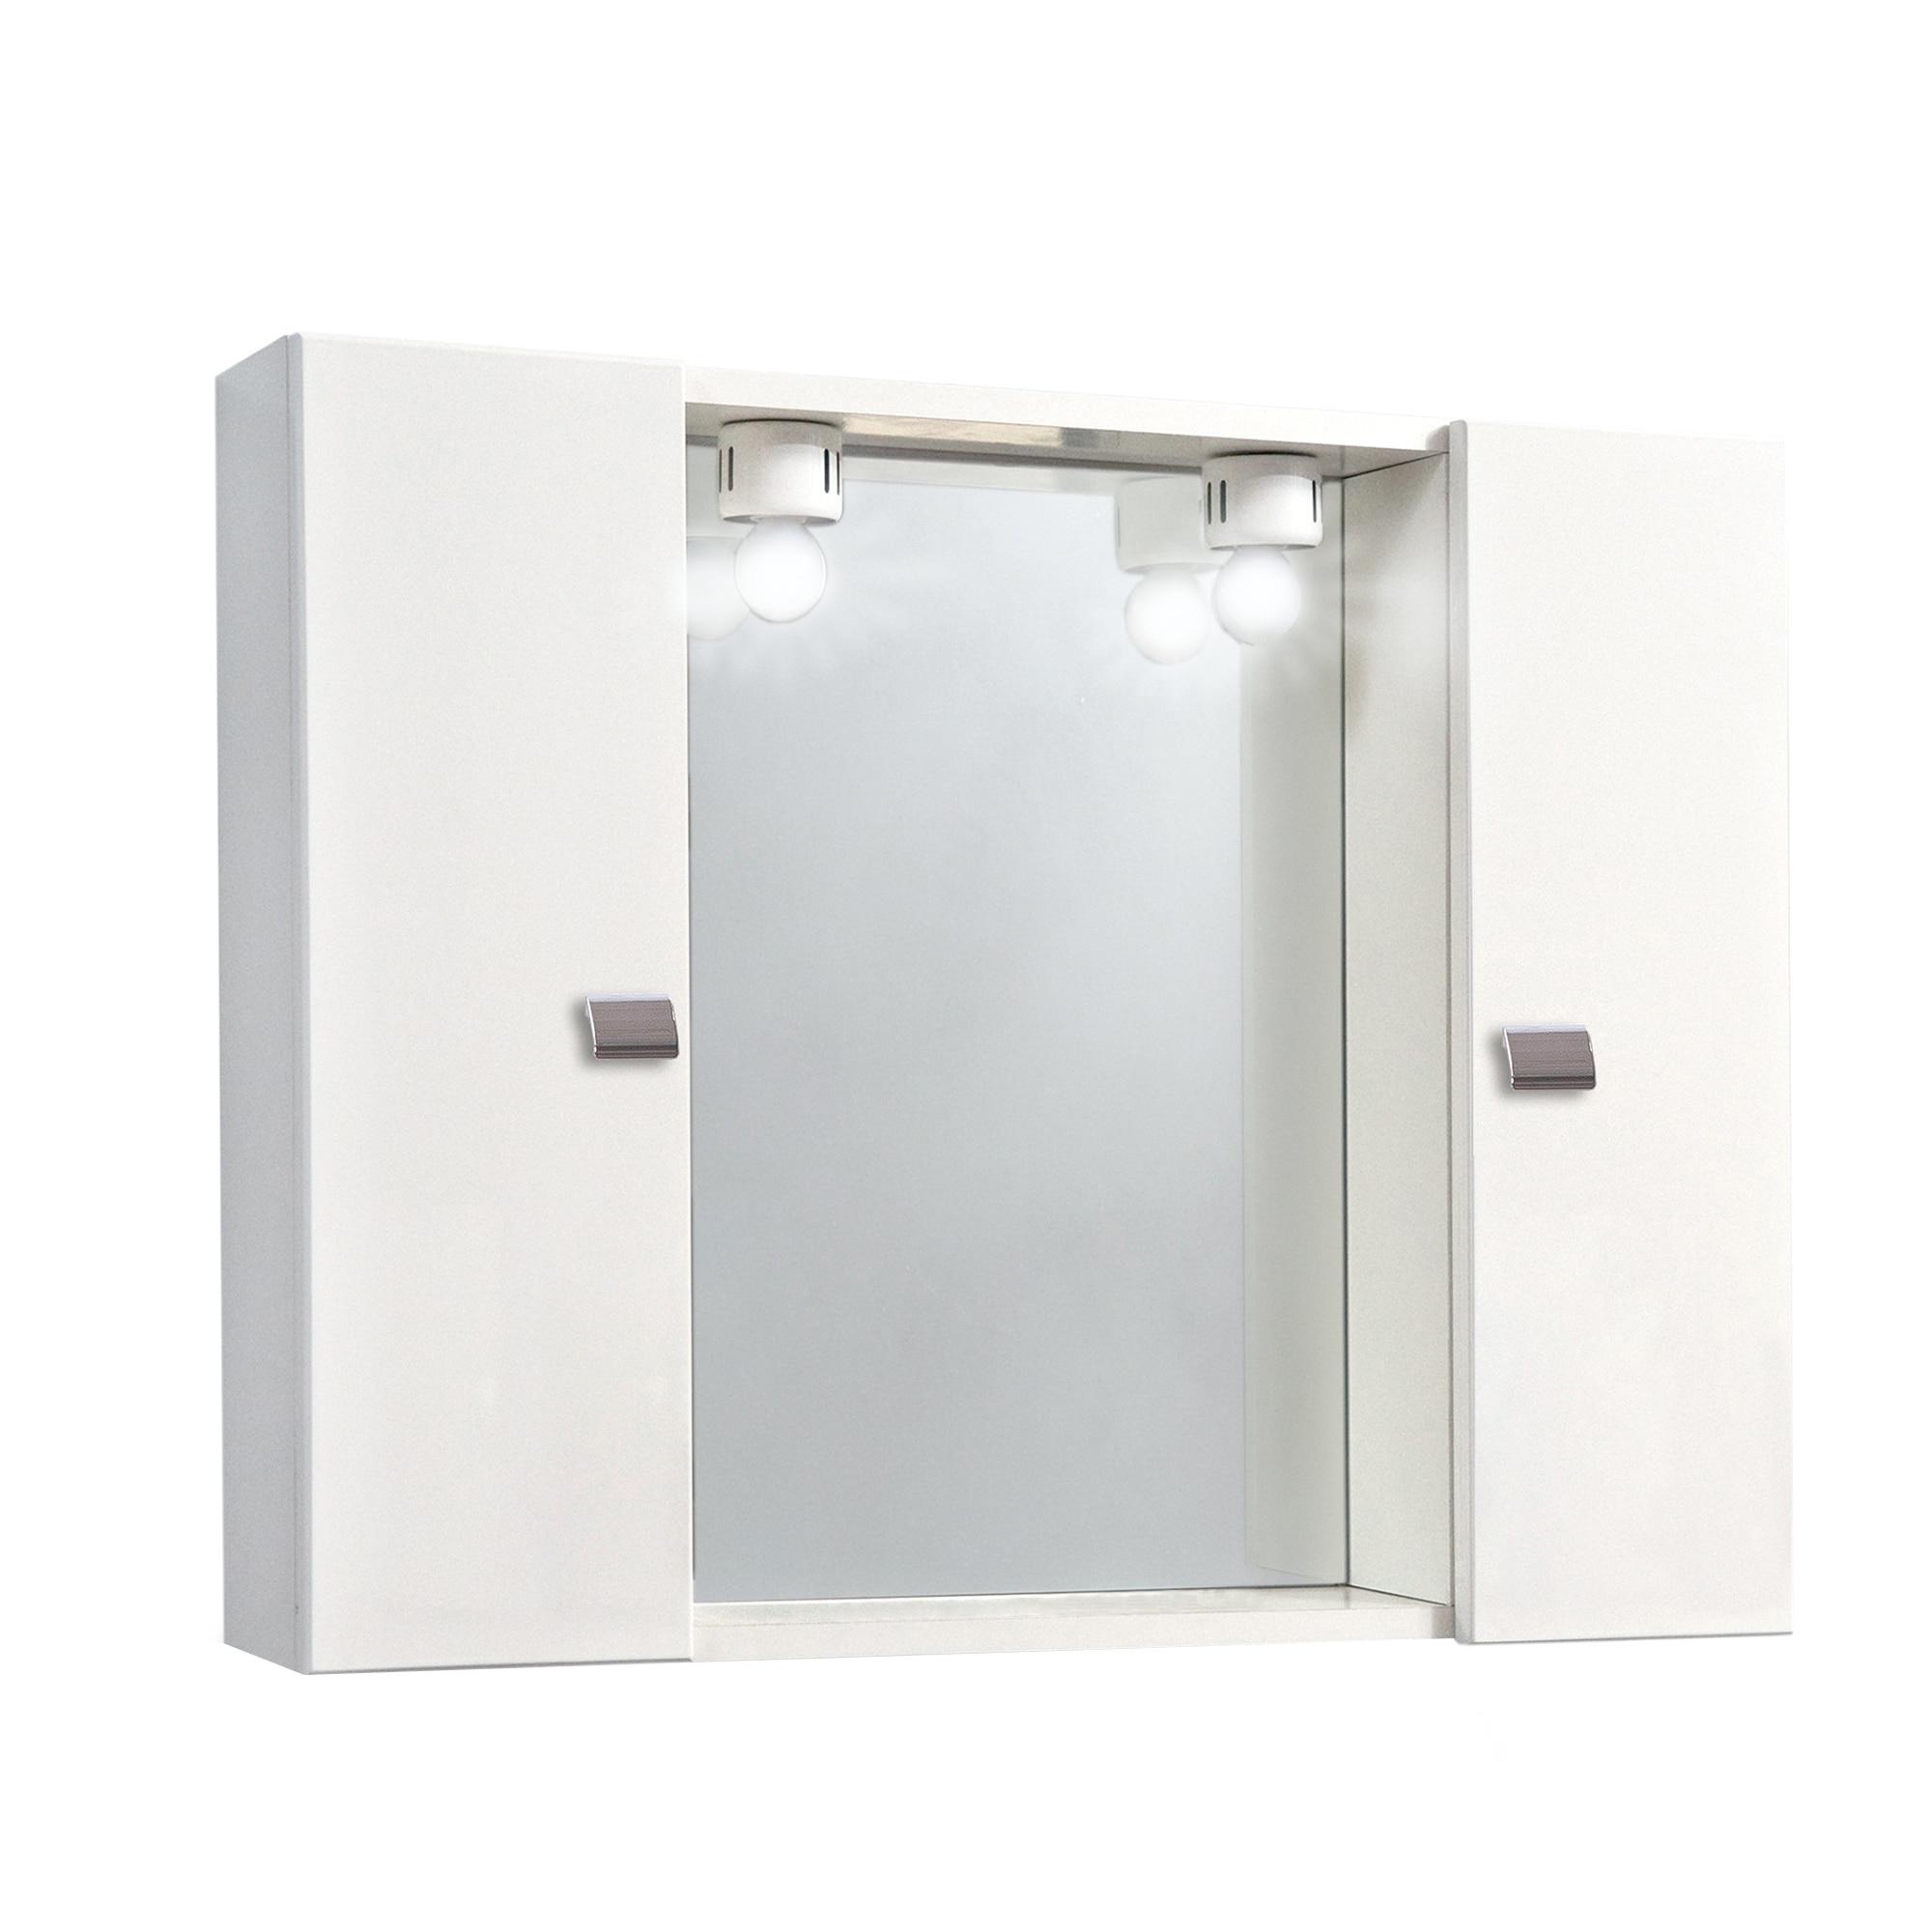 Fotografie Oglinda Kring, cu doua dulapioare albe si iluminare, 77x57x16cm